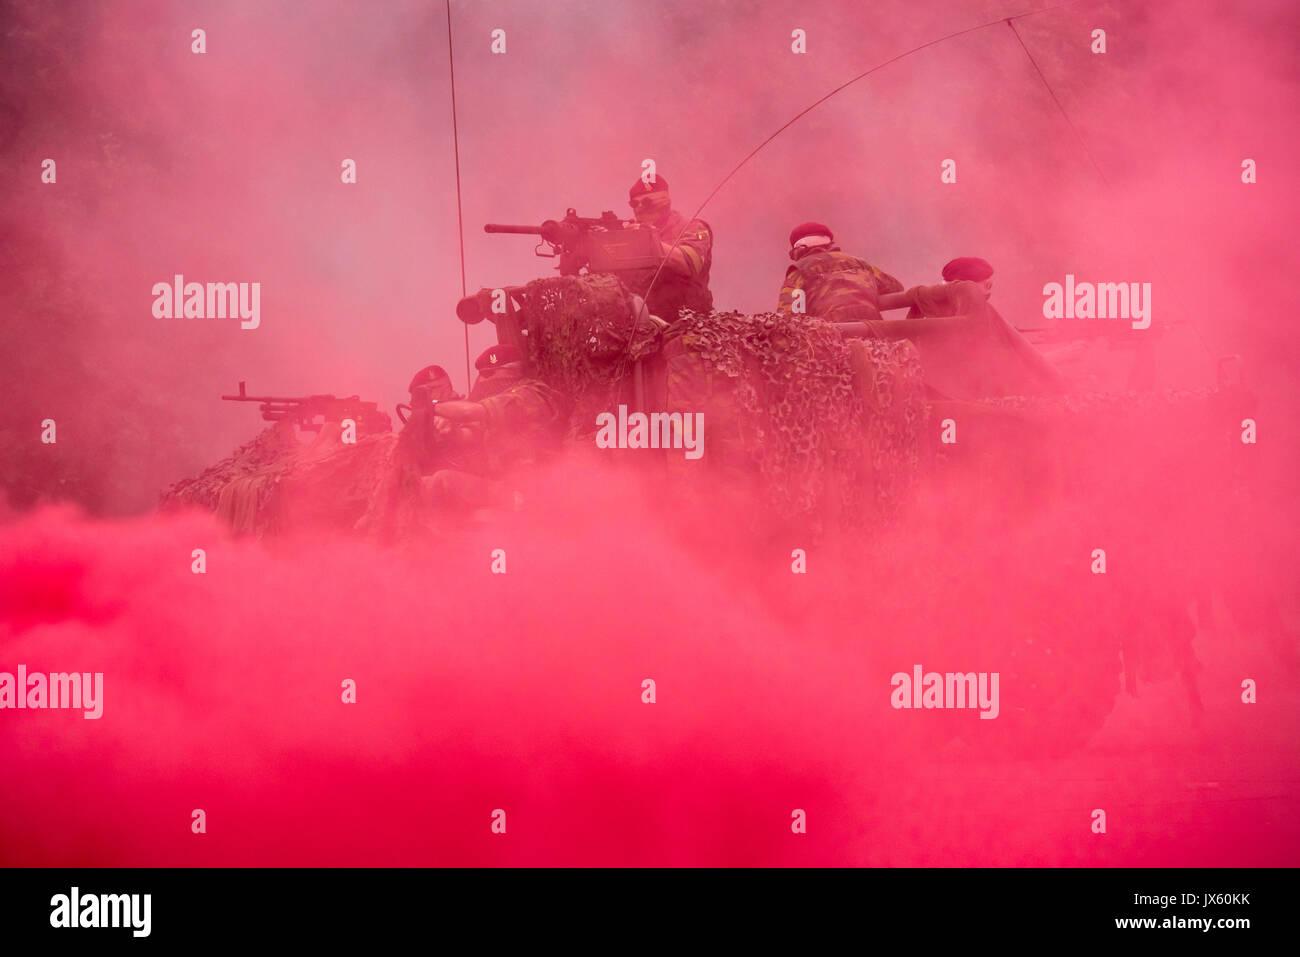 red-smoke-curtain-and-commandos-of-the-para-commando-regiment-under-JX60KK.jpg